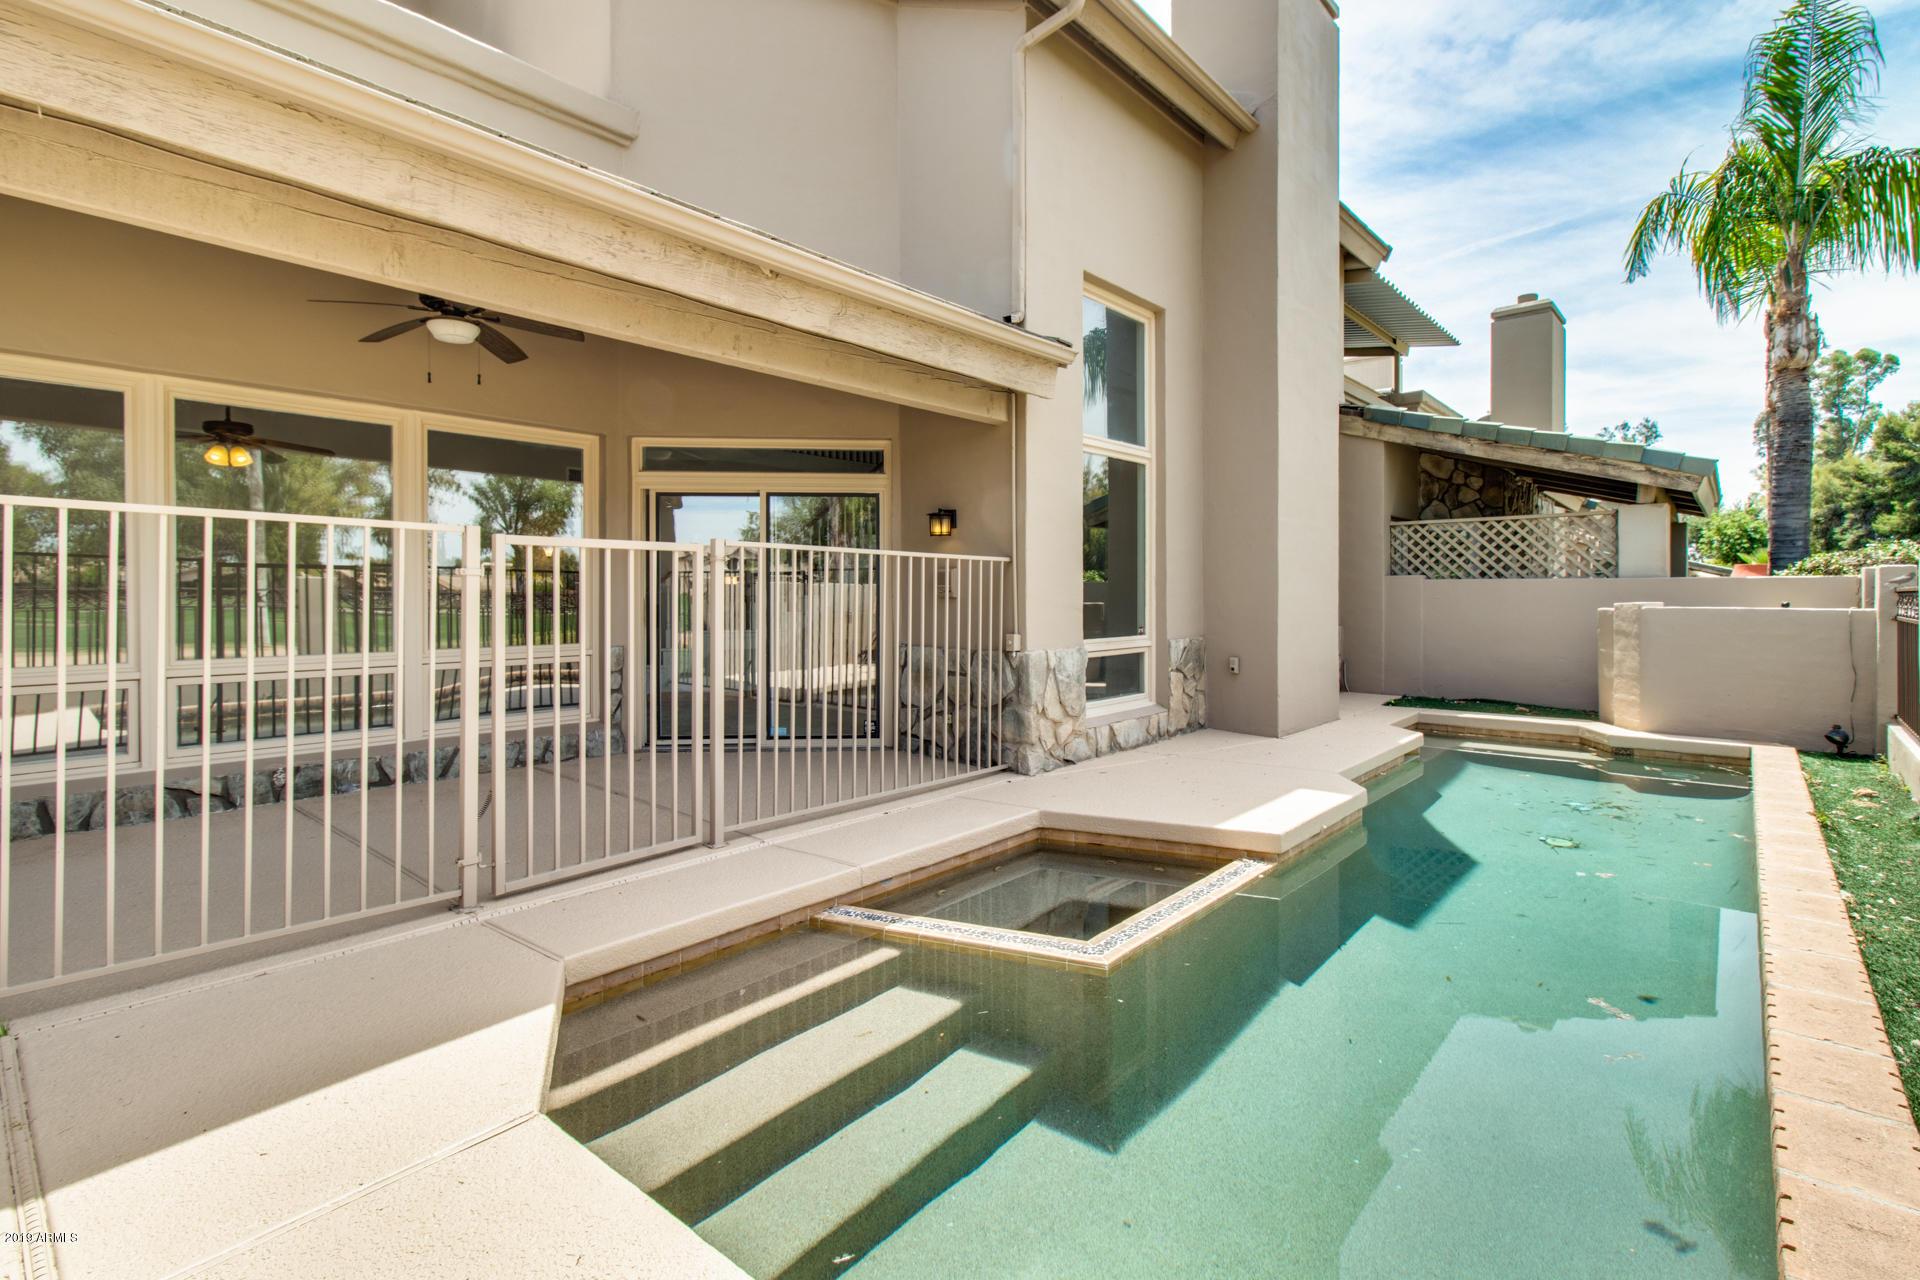 MLS 5924024 10872 N 78TH Street, Scottsdale, AZ 85260 Scottsdale AZ Private Pool